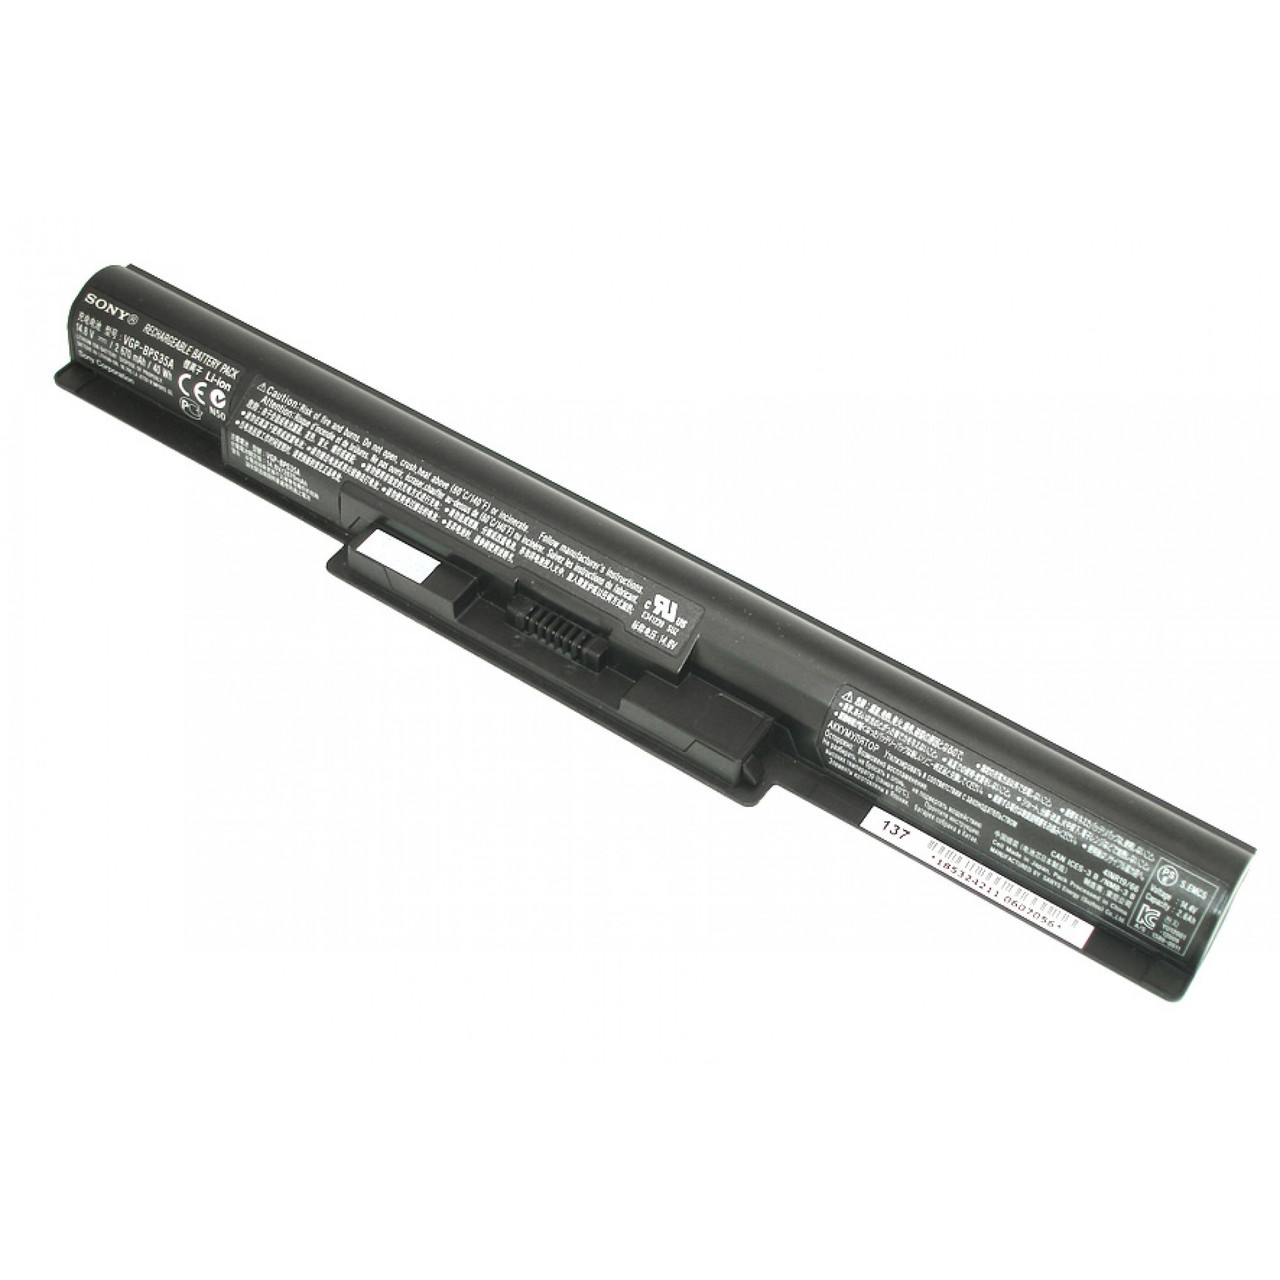 Аккумулятор для ноутбука Sony VGP-BPS35A (14.8V 2600 mAh)